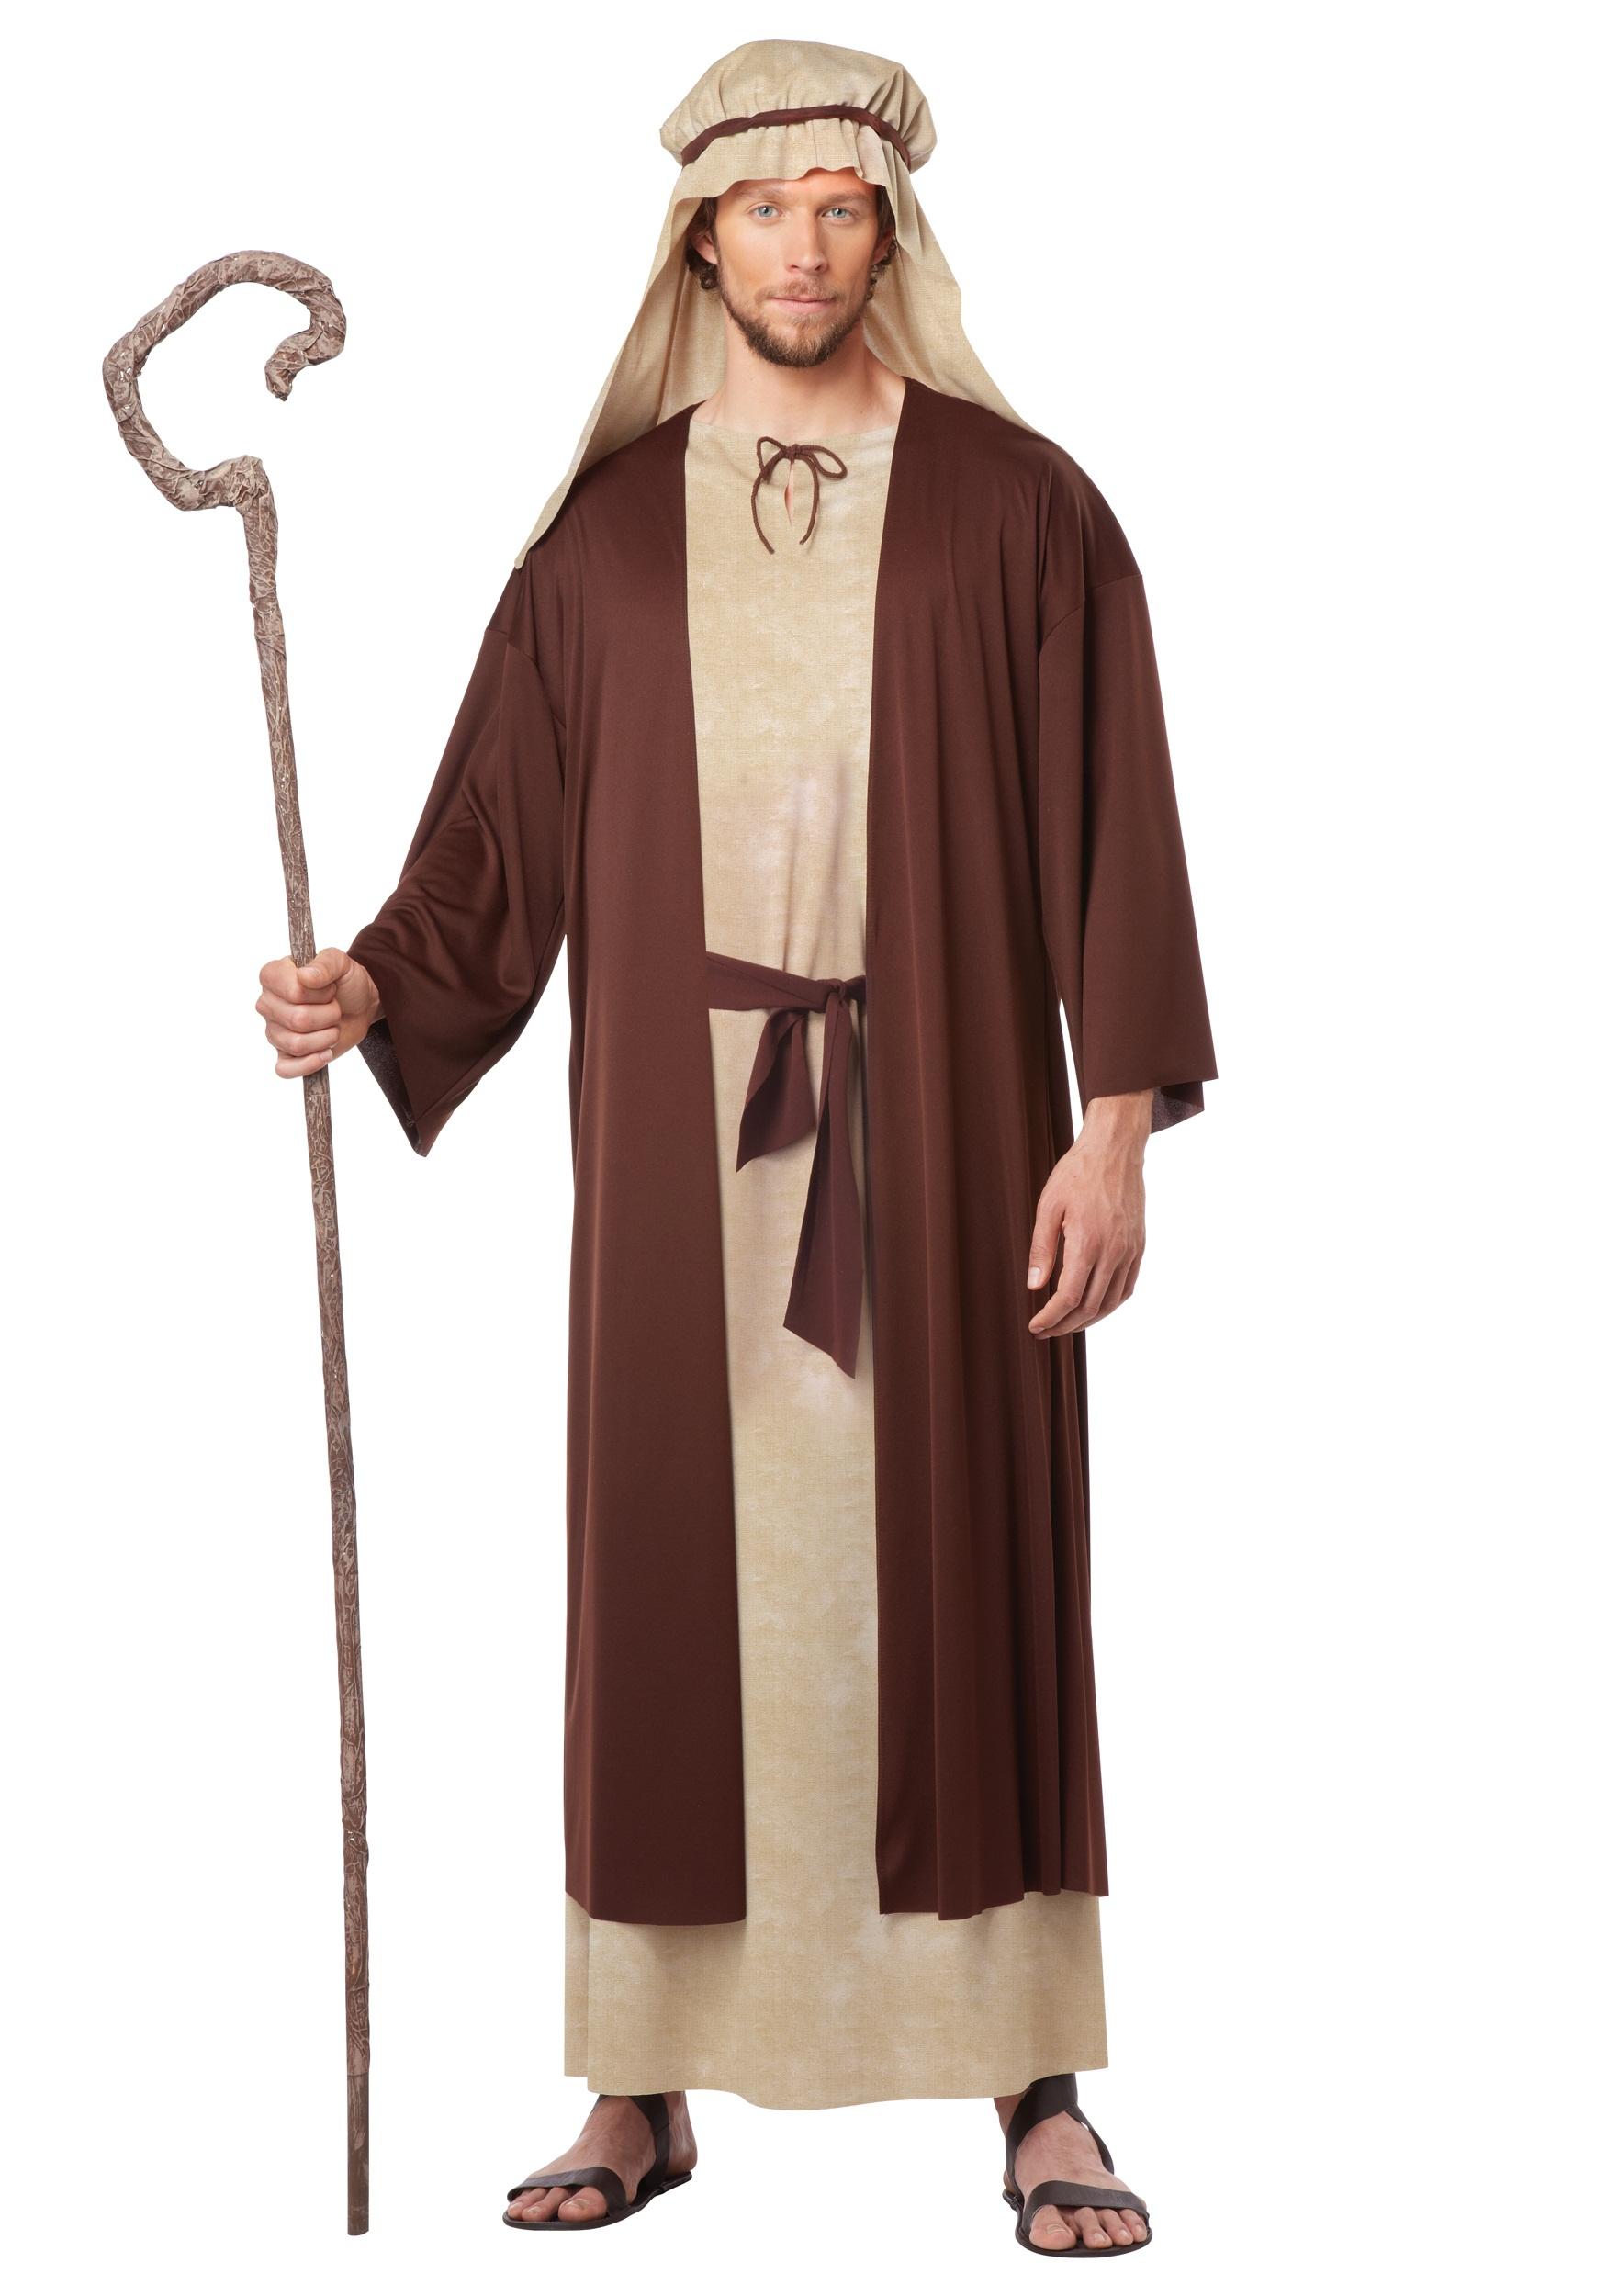 sc 1 st  Halloween Costumes UK & Adult Saint Joseph Costume